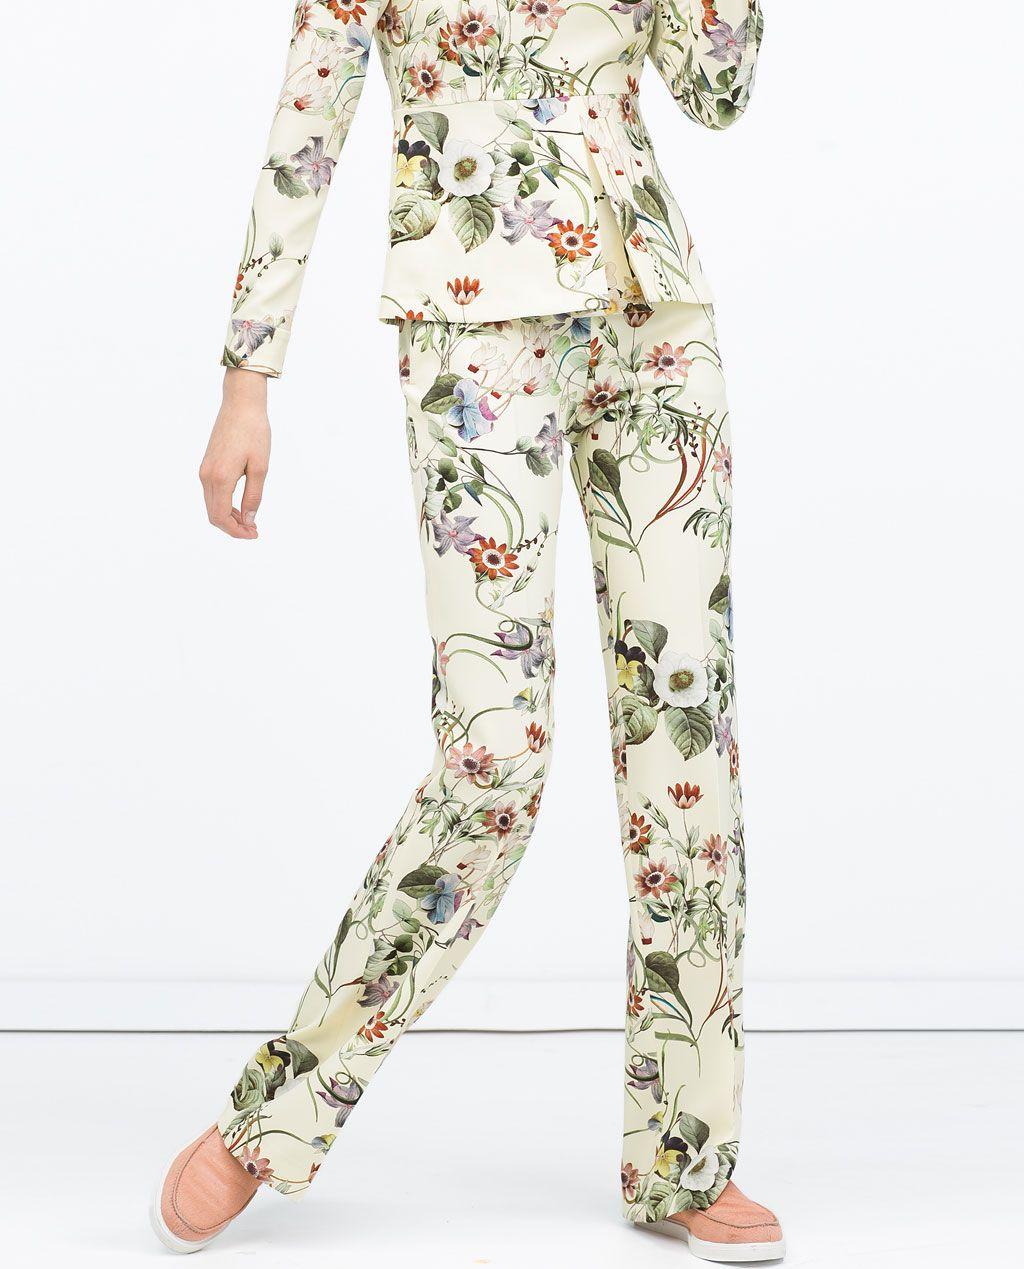 Pin By Tovmali On Zara Ss15 Loose Trousers Women Loose Trousers Trousers Women